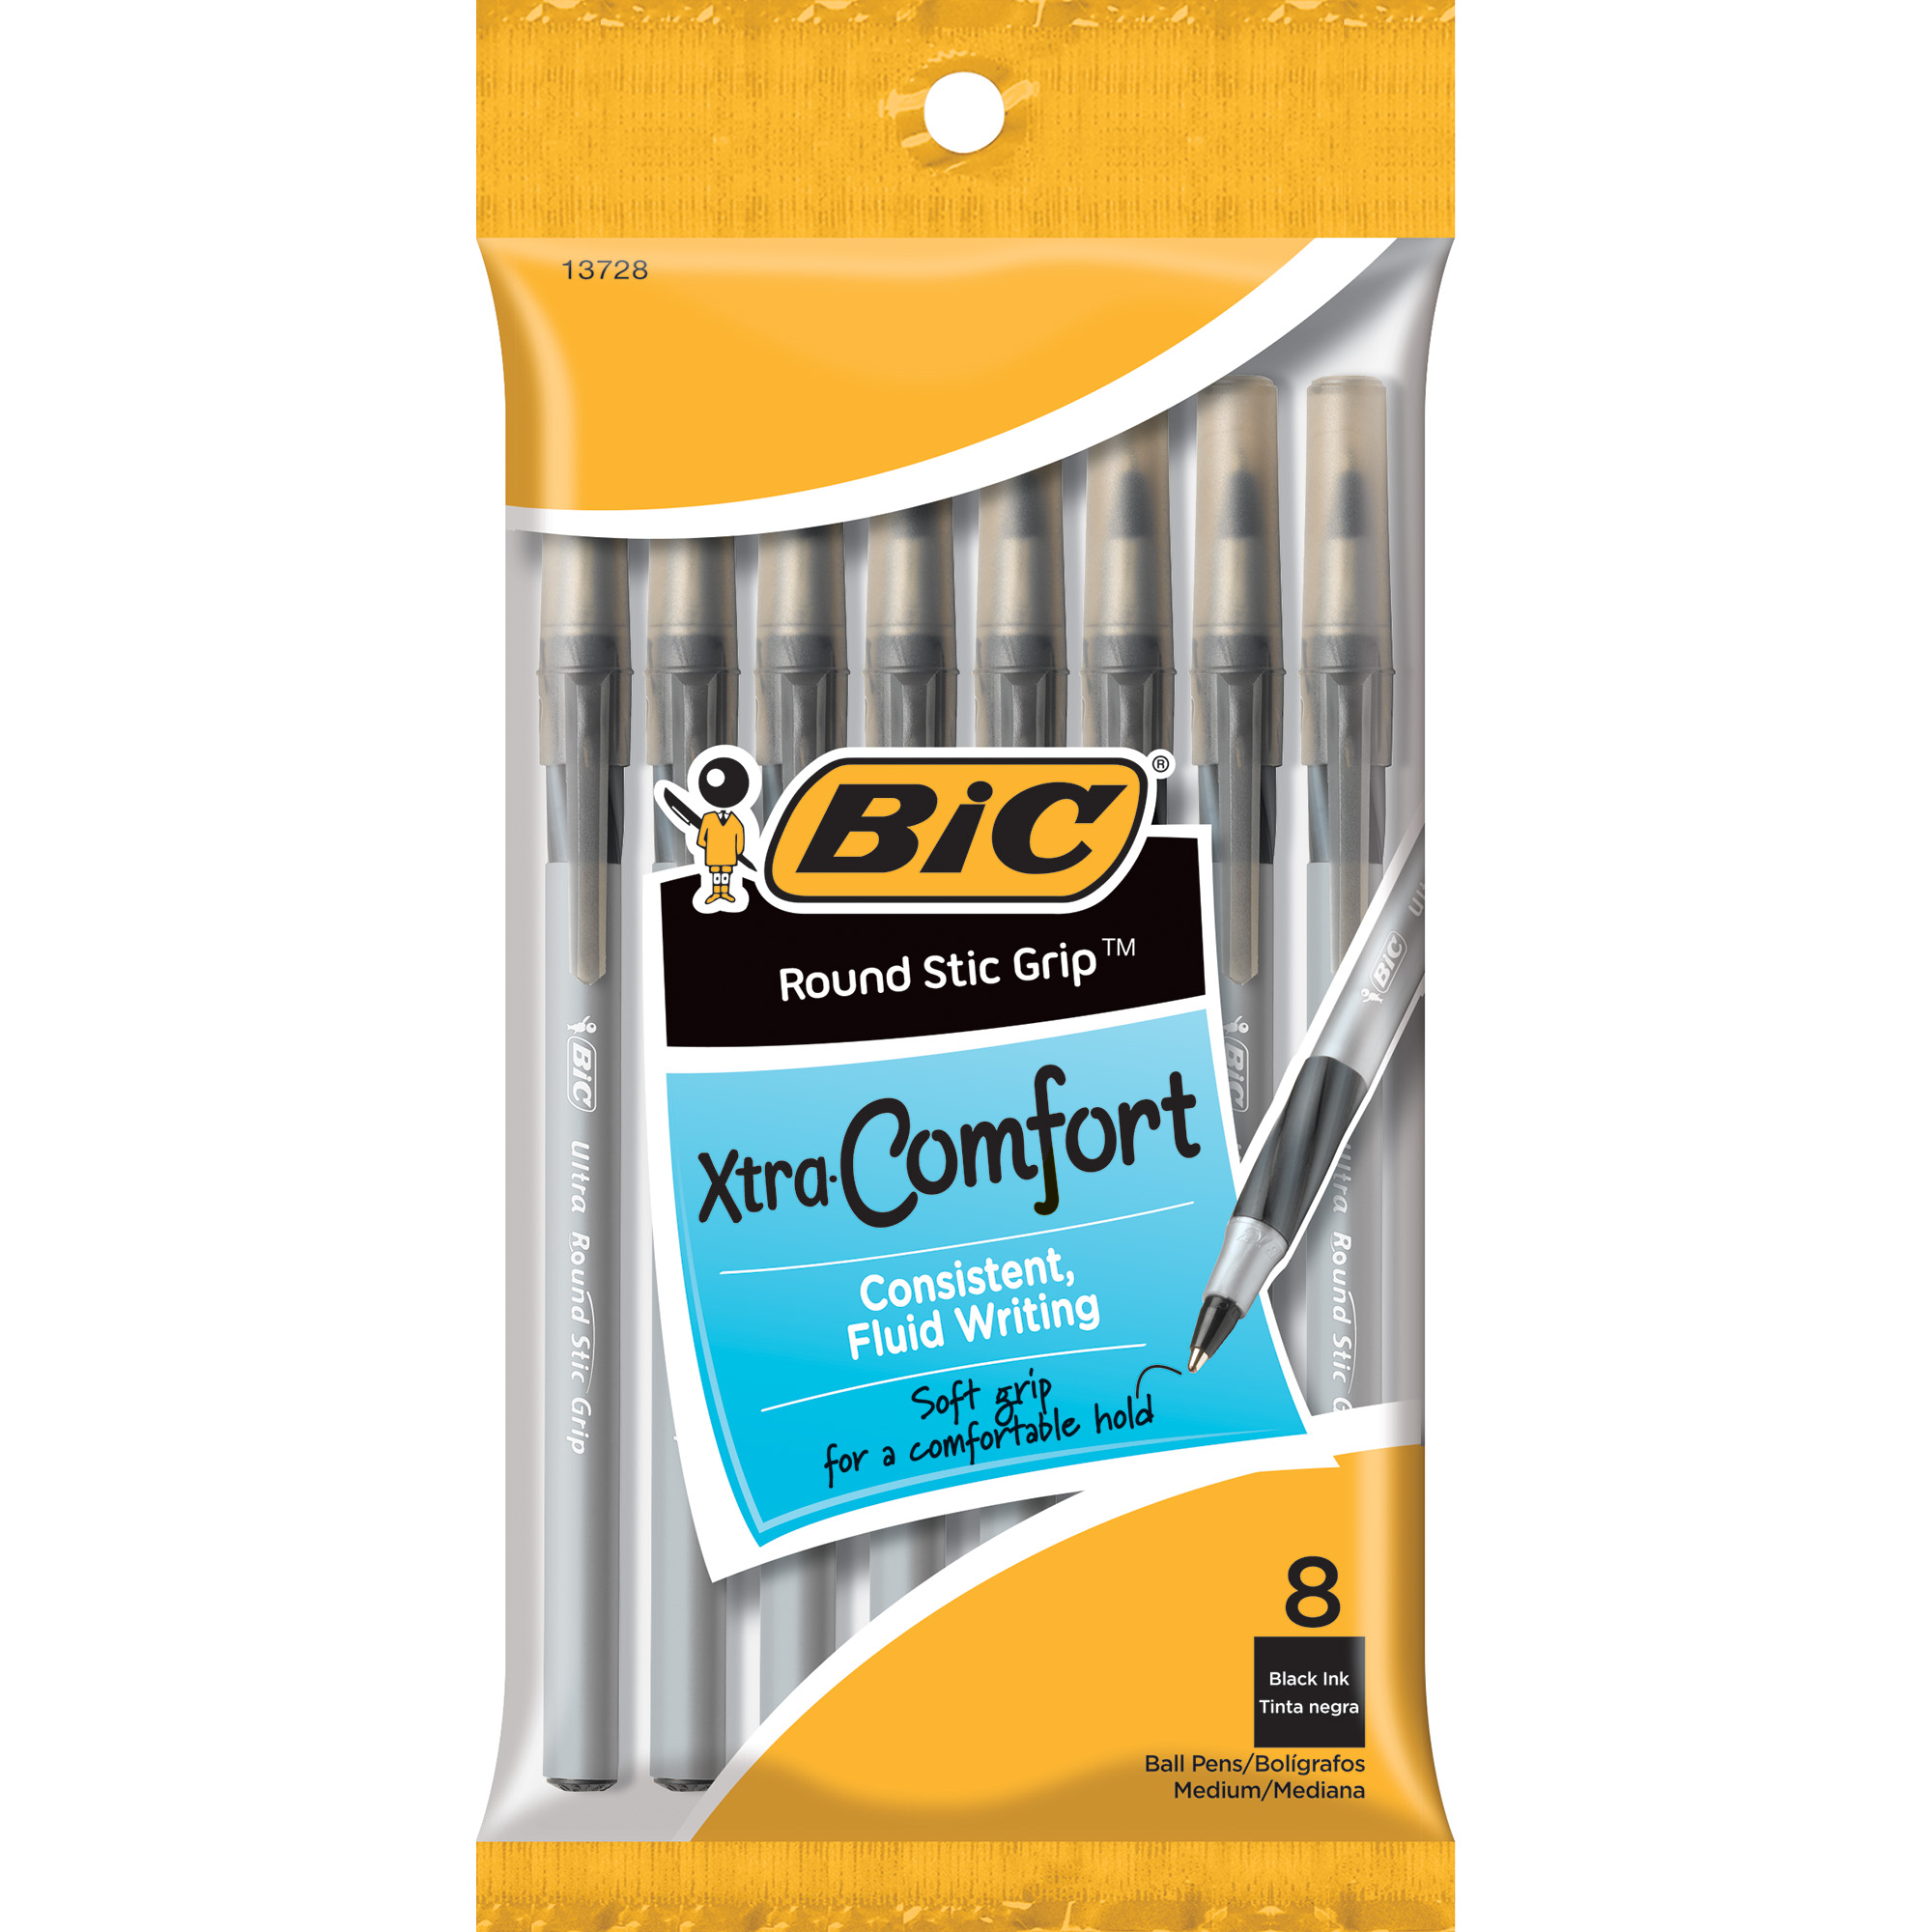 Bic Xtra-Comfort Ballpoint Pens, Black, 8-pack